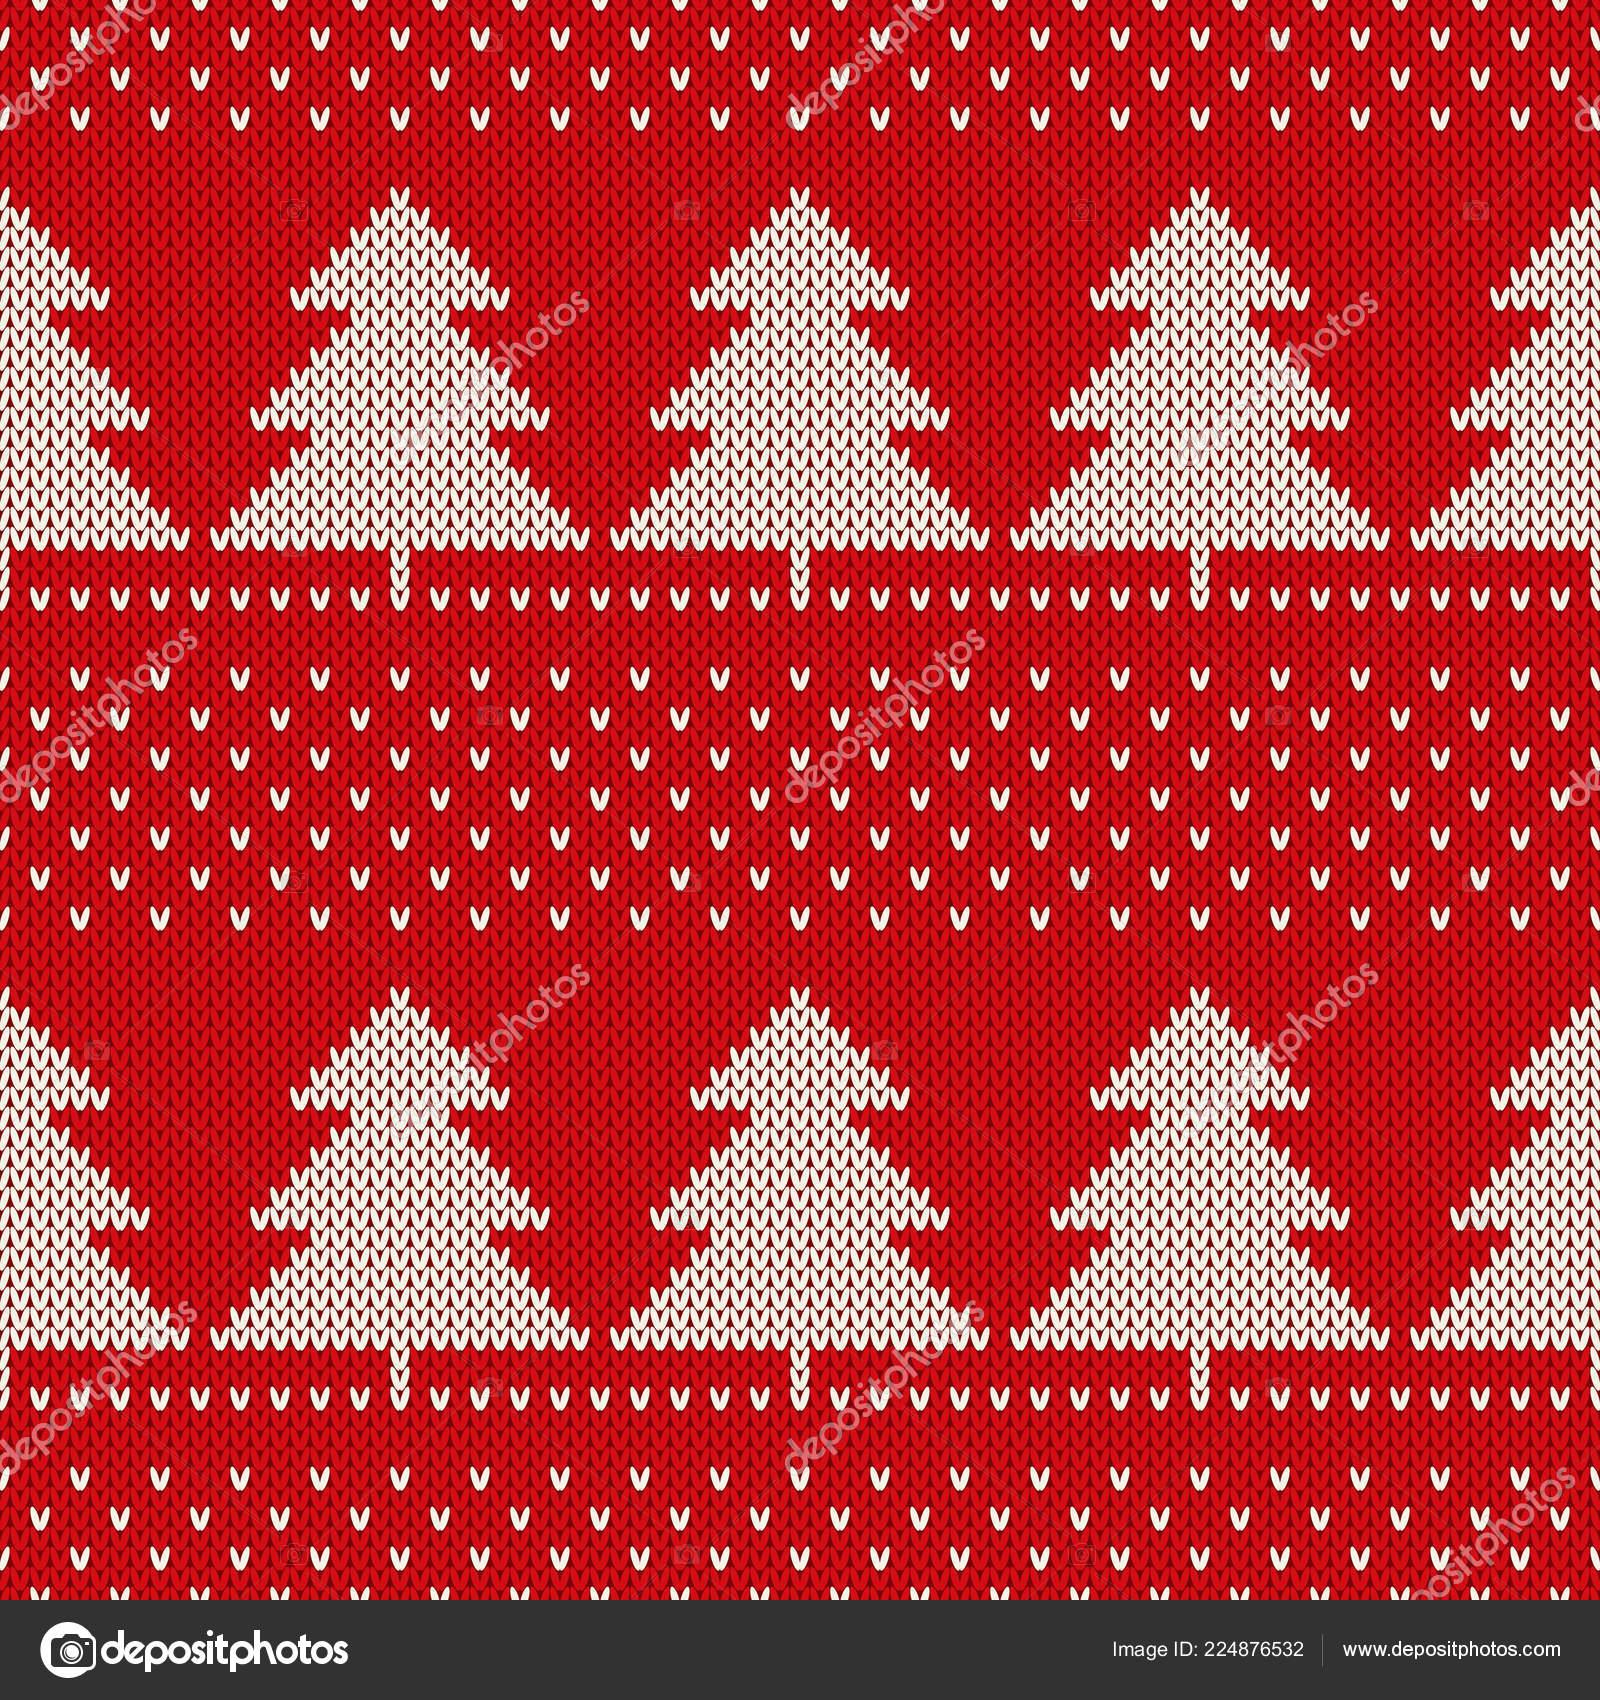 Christmas Knitted Pattern Christmas Trees Wool Knitting Seamless